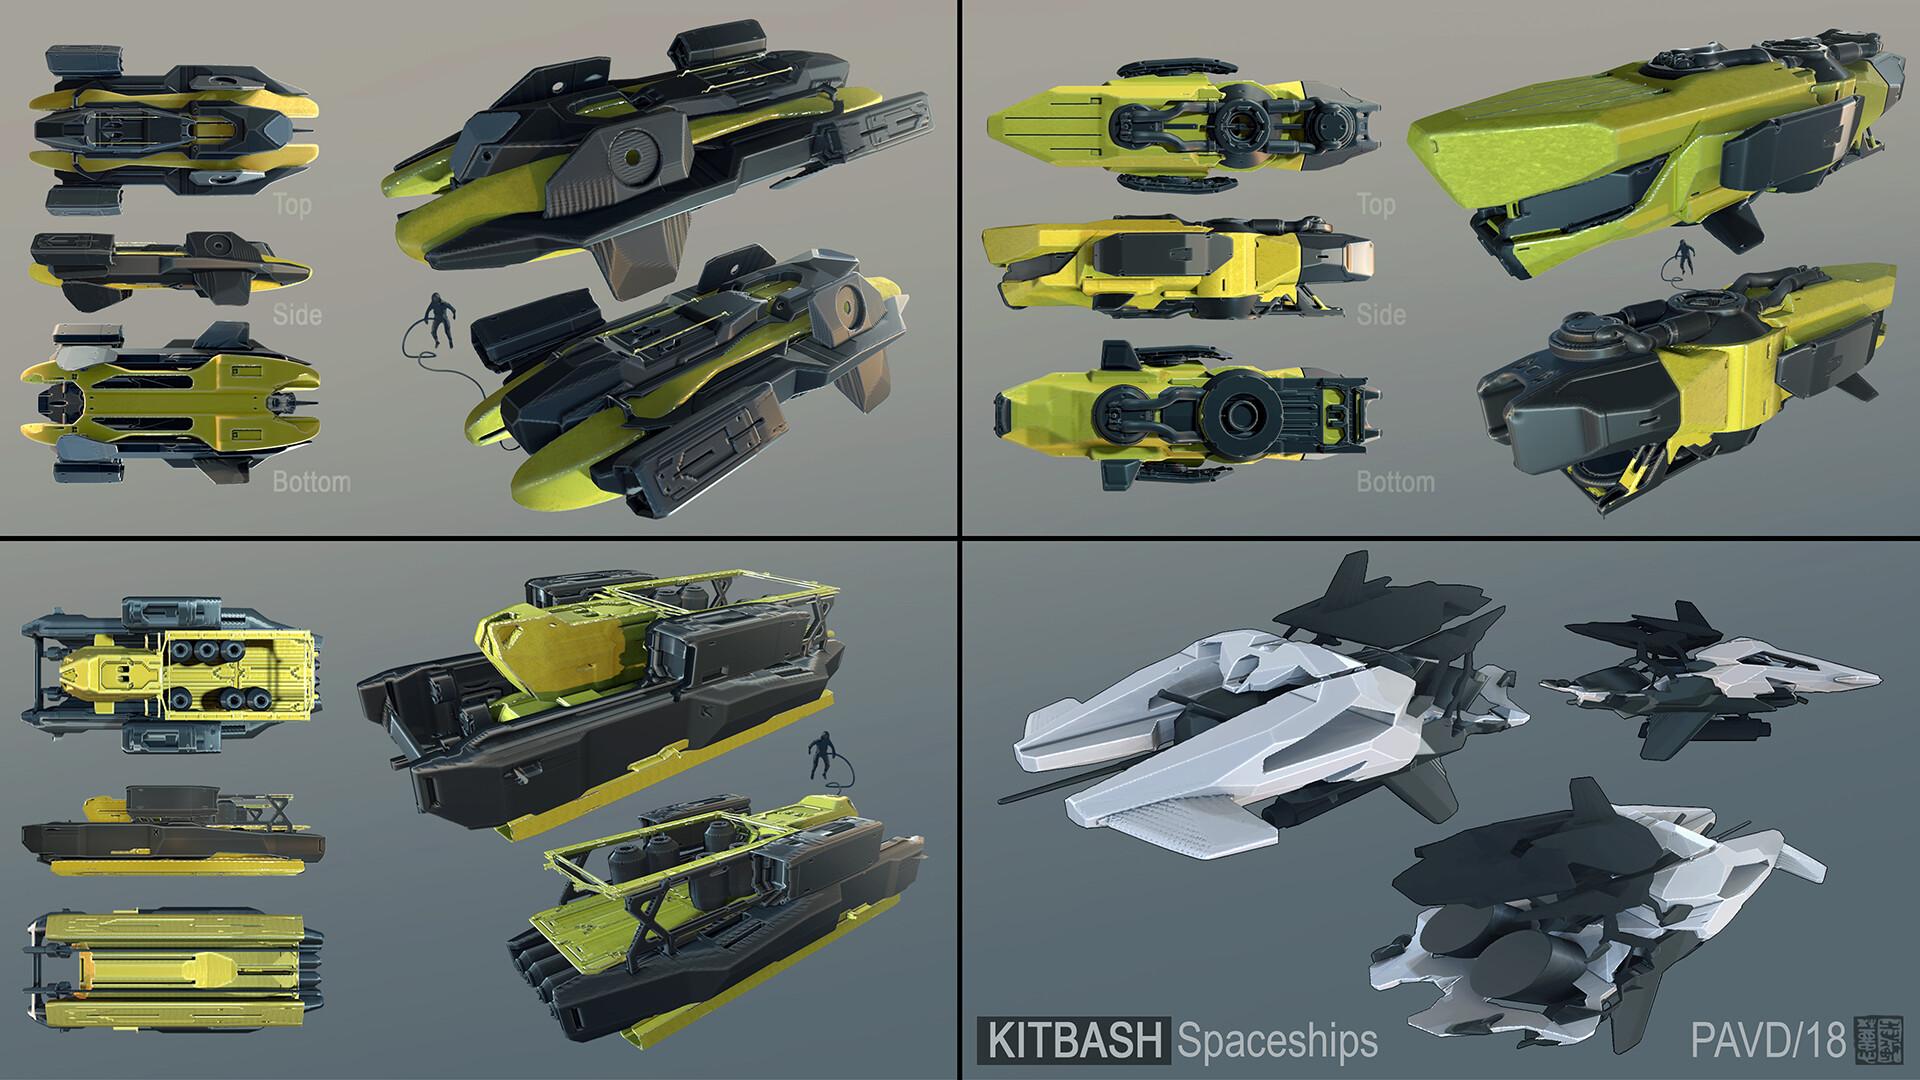 Kitbash spaceship sketches...